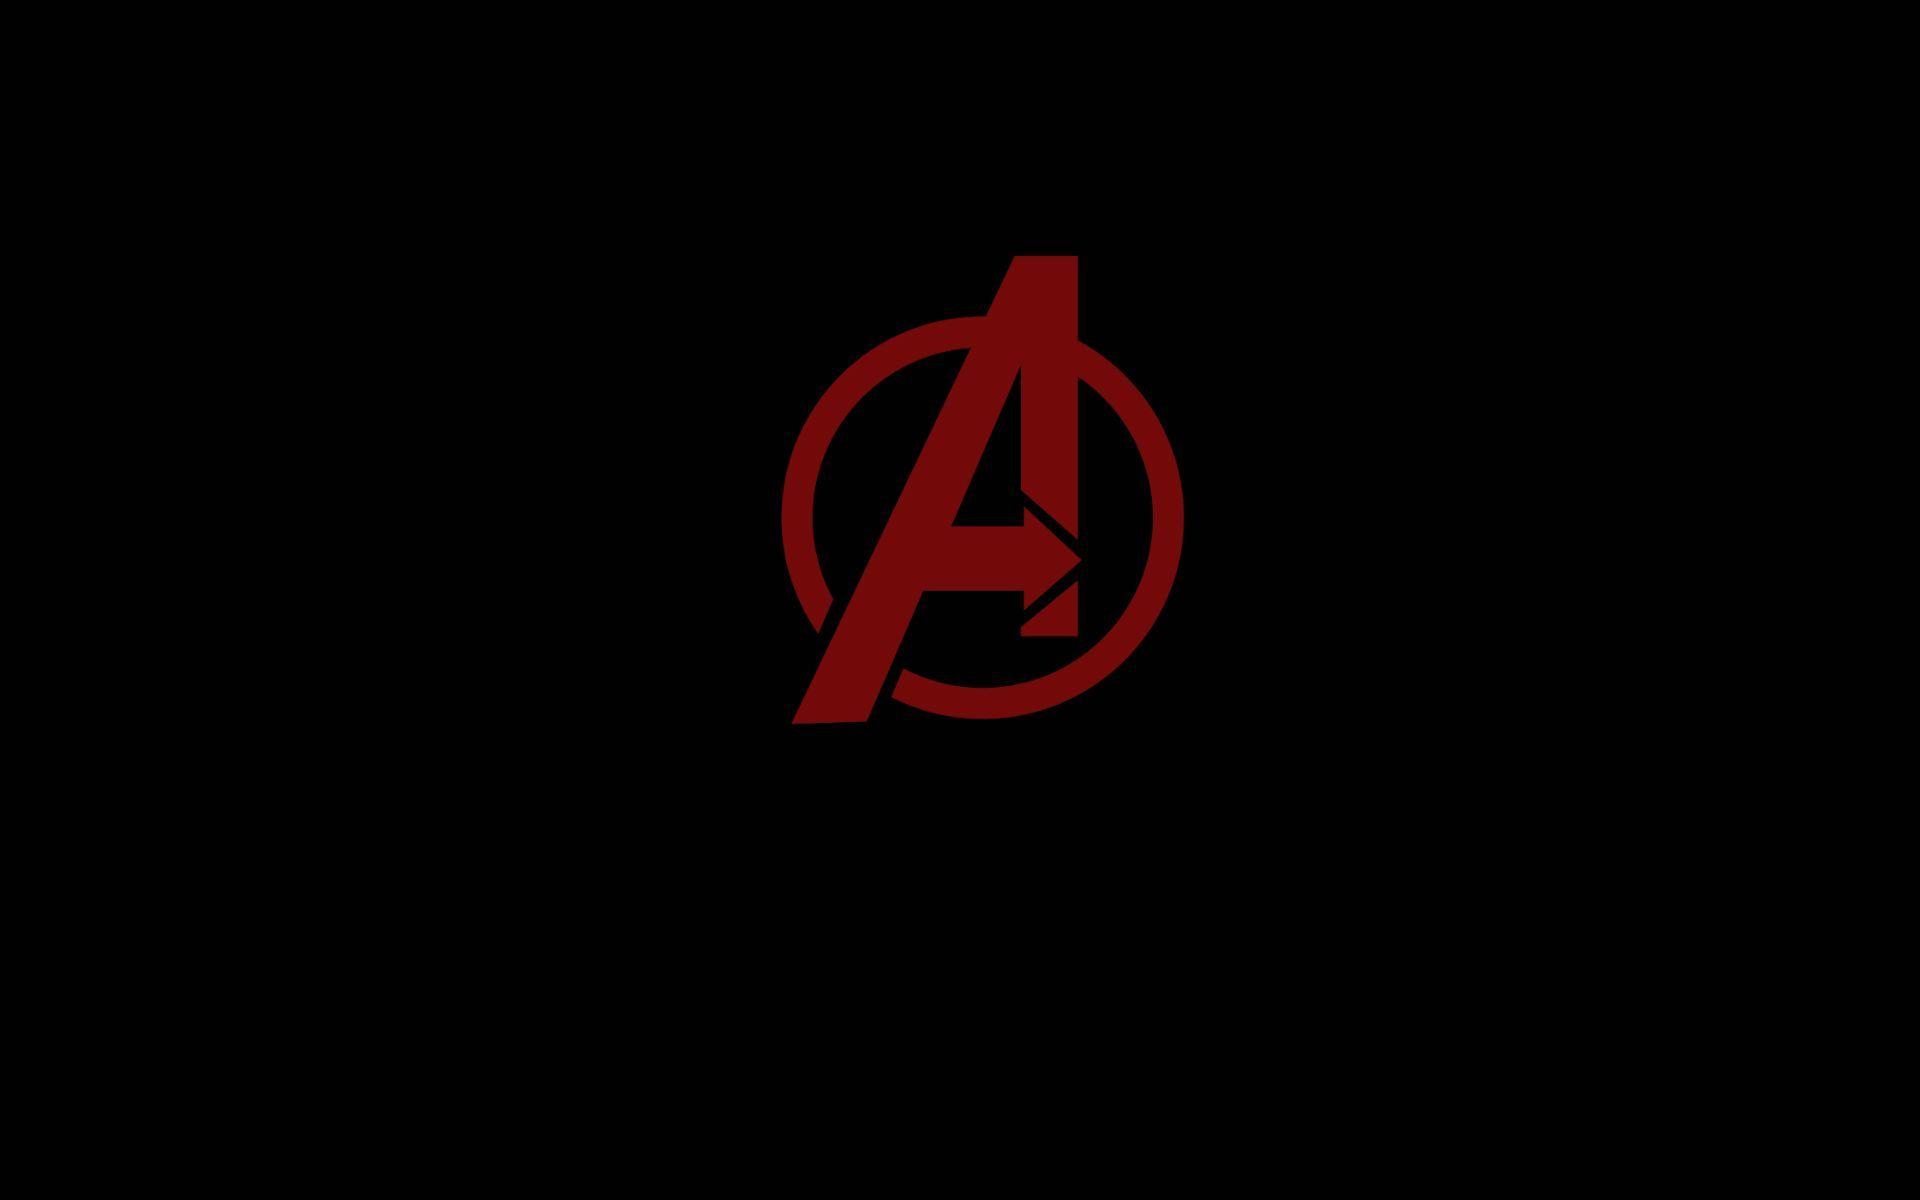 Marvel Avengers Logo Wallpapers Top Free Marvel Avengers Logo Backgrounds Wallpaperaccess Avengers Wallpaper Avengers Logo Marvel Phone Wallpaper